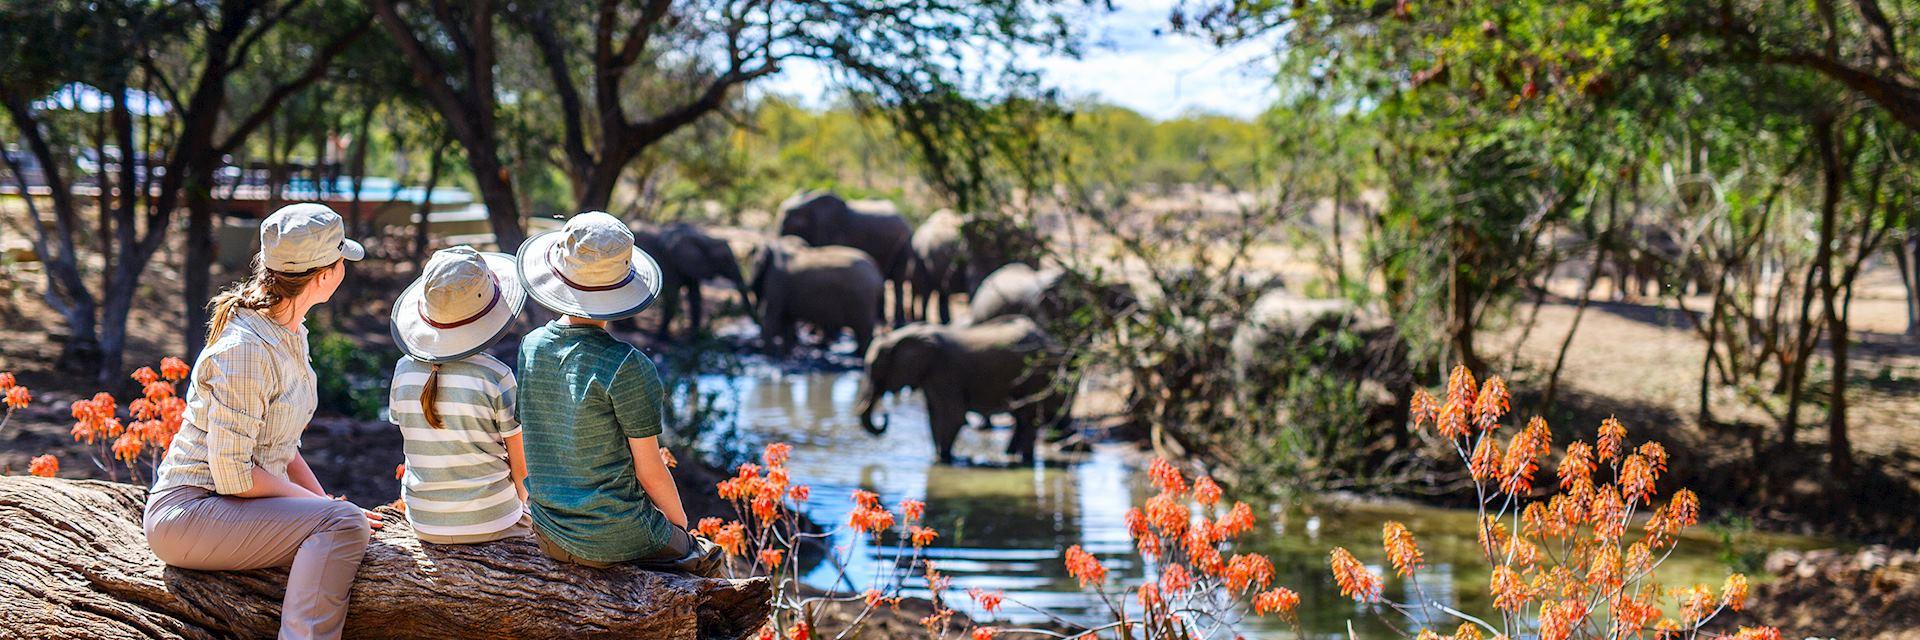 Family on an African safari